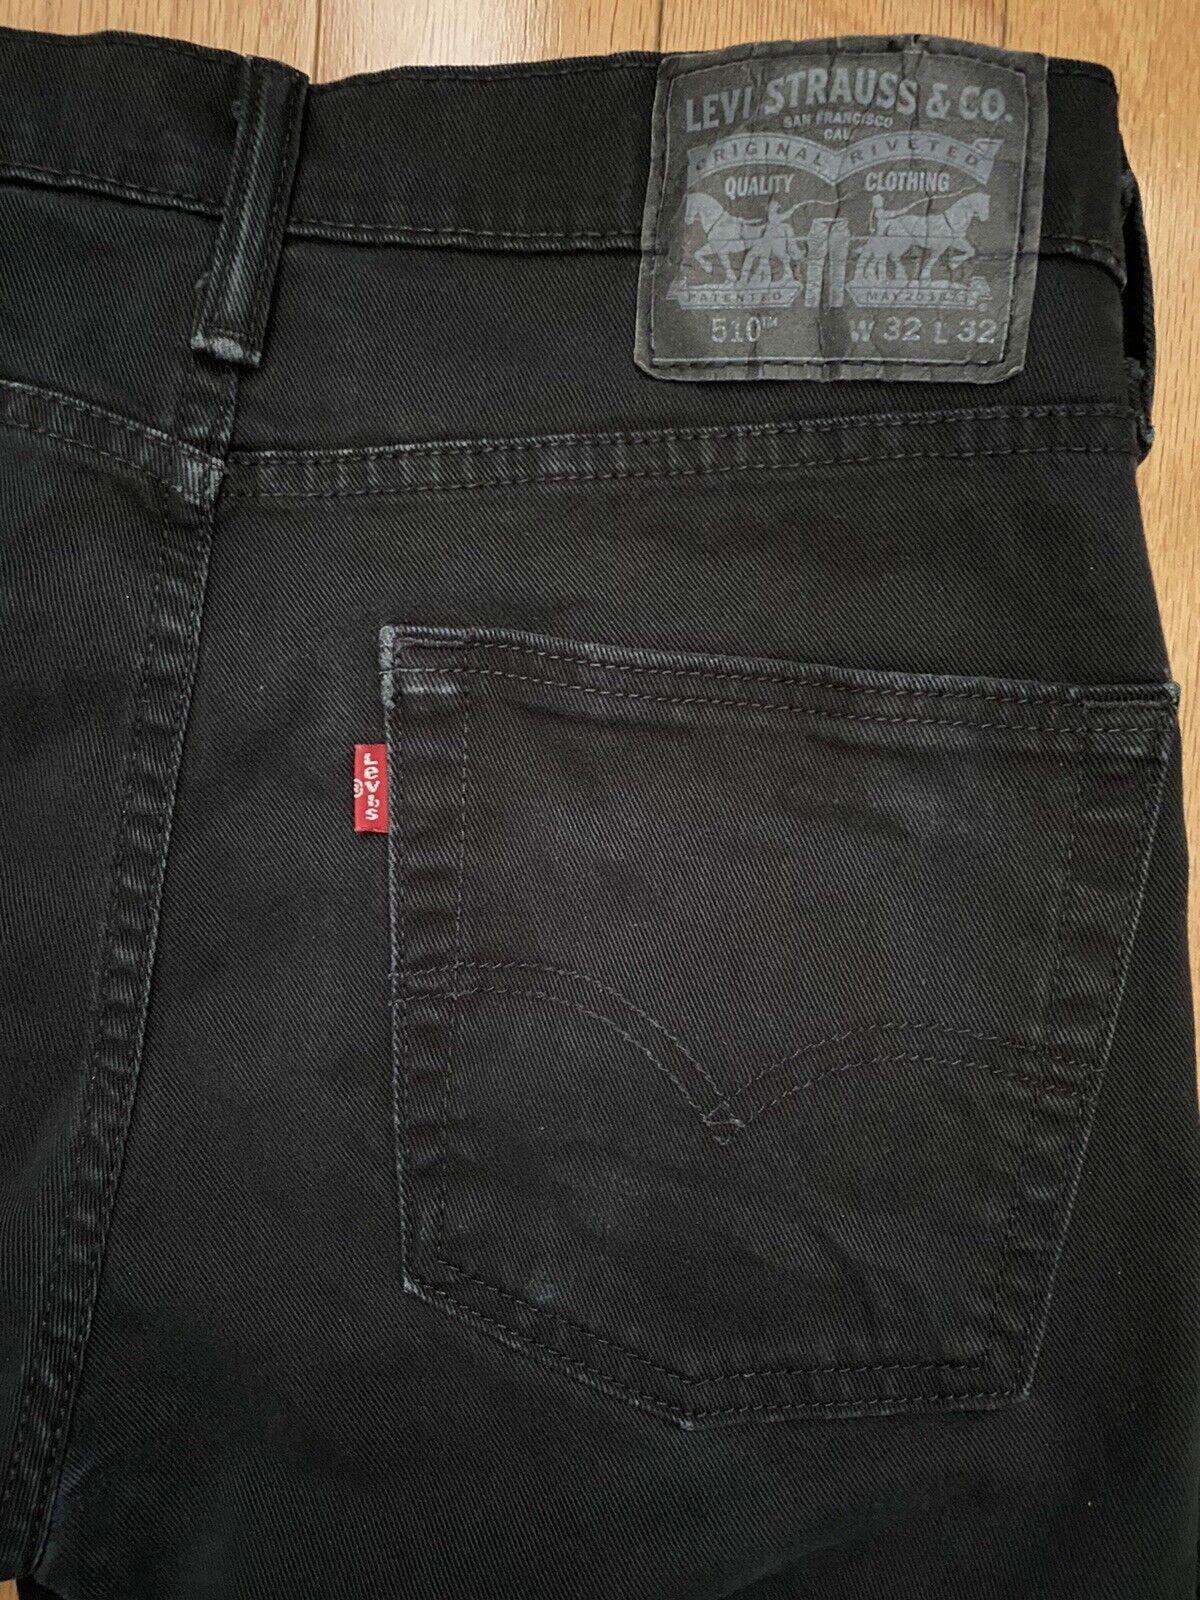 Levis 510 skinny jeans - 32x32 BLACK - image 1